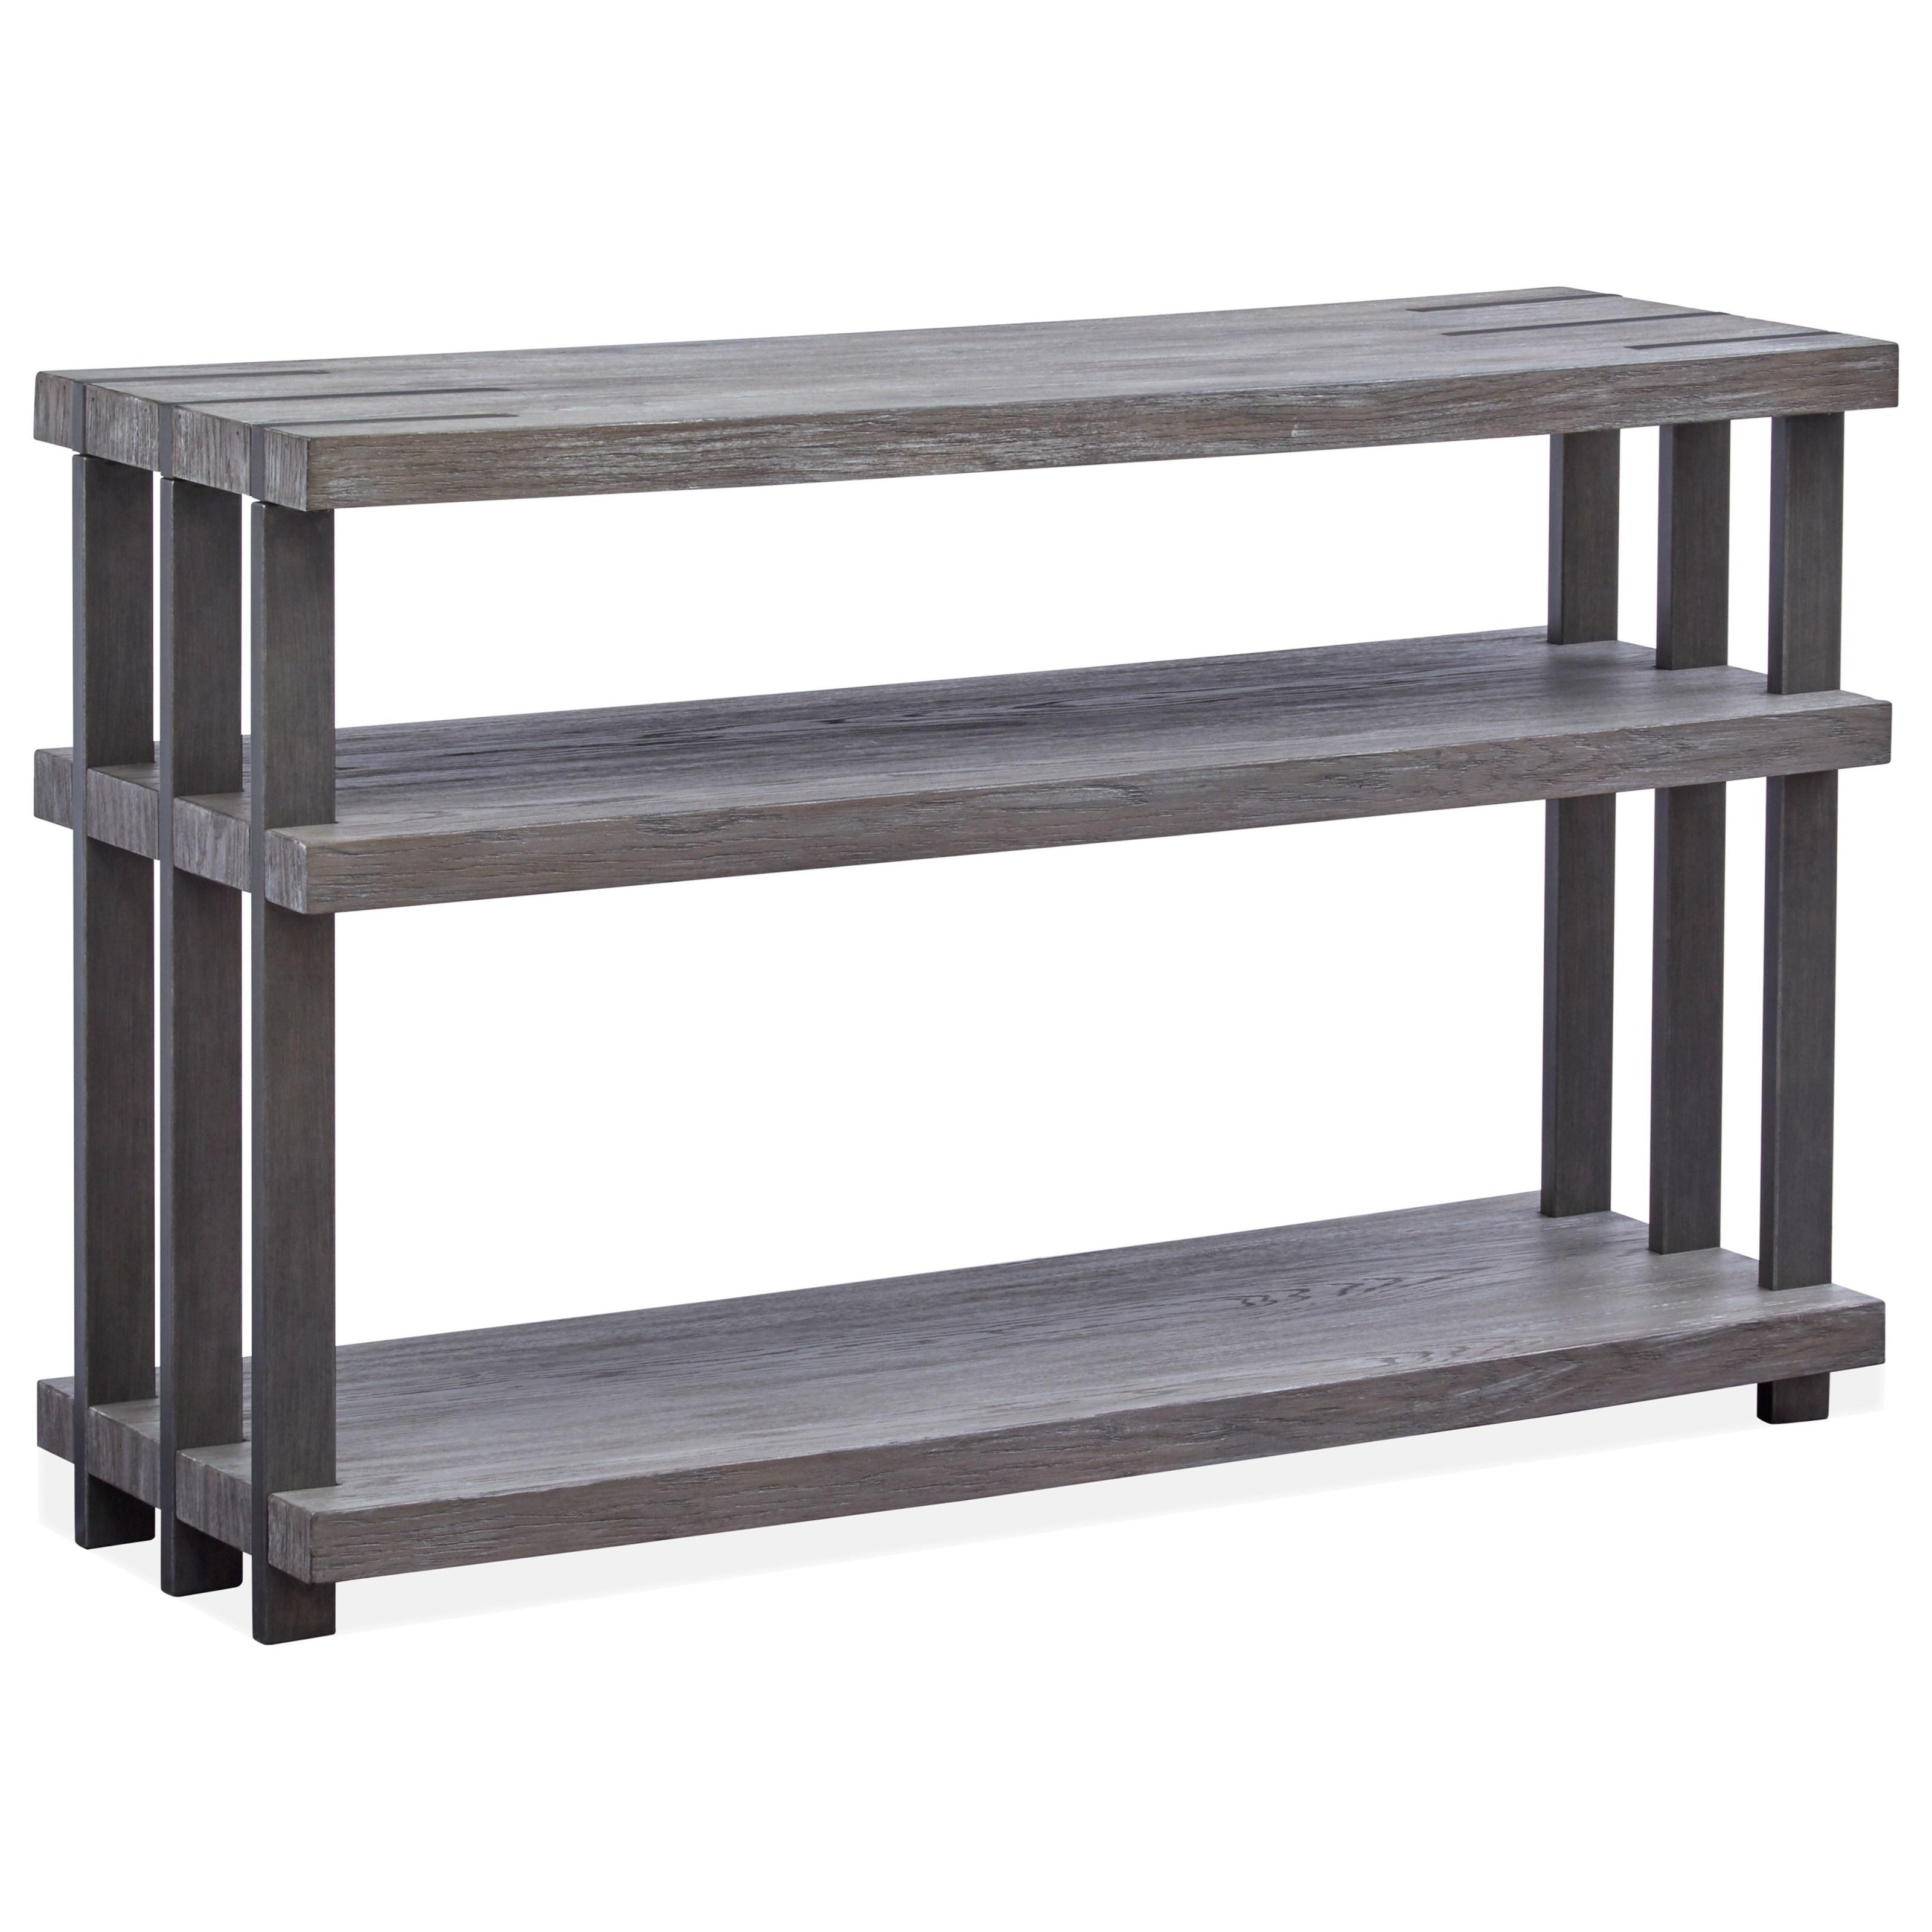 Eldridge Sofa Table by Magnussen Home at Darvin Furniture